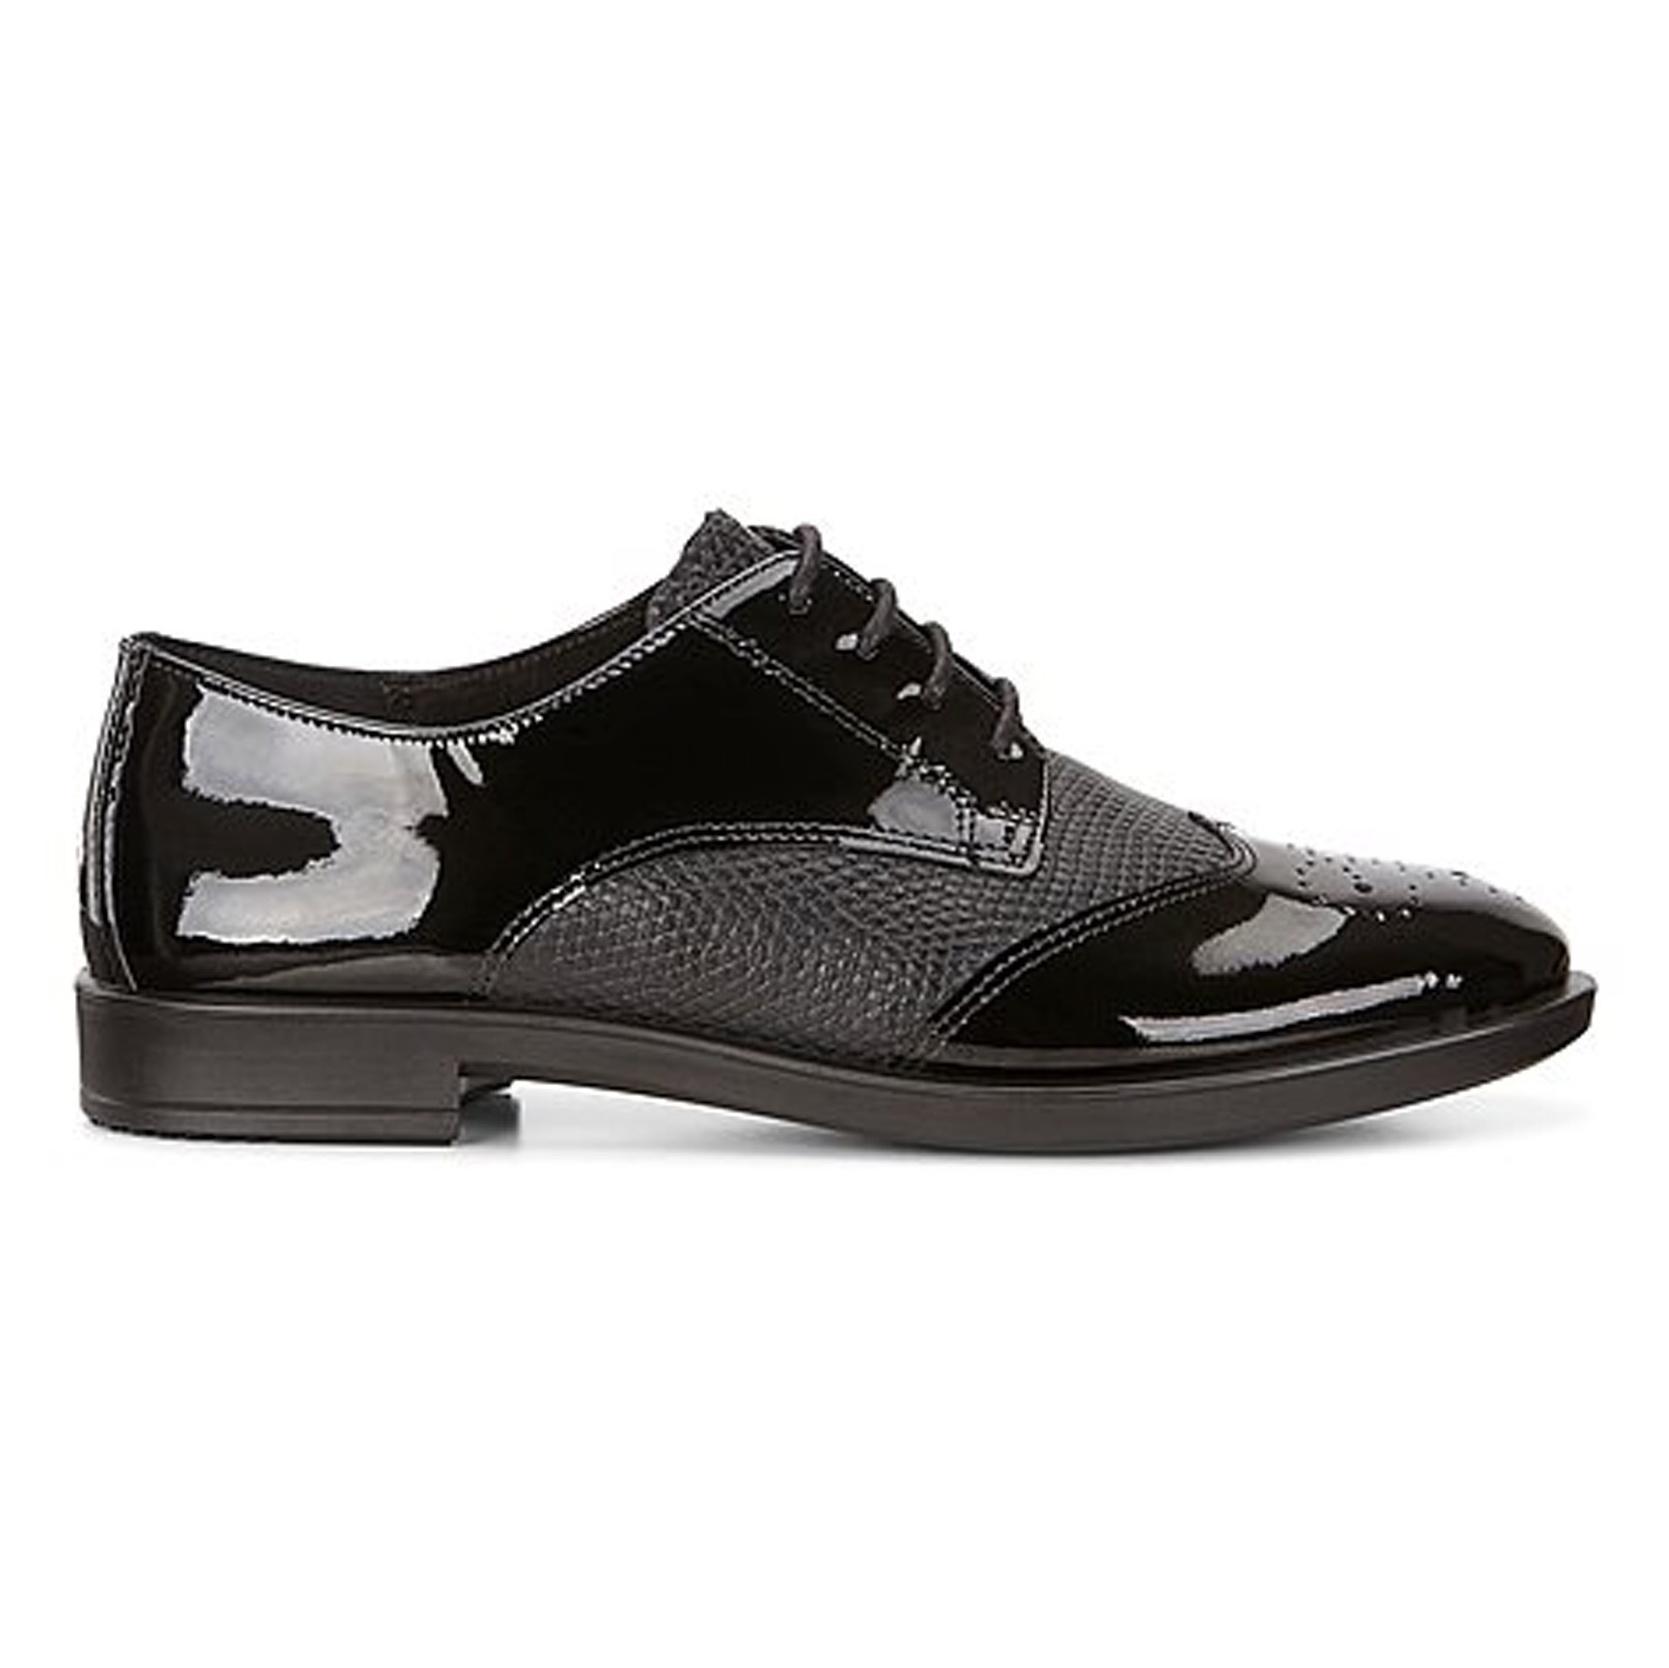 تصویر کفش چرم رسمی مردانه Shape M 15 – اکو